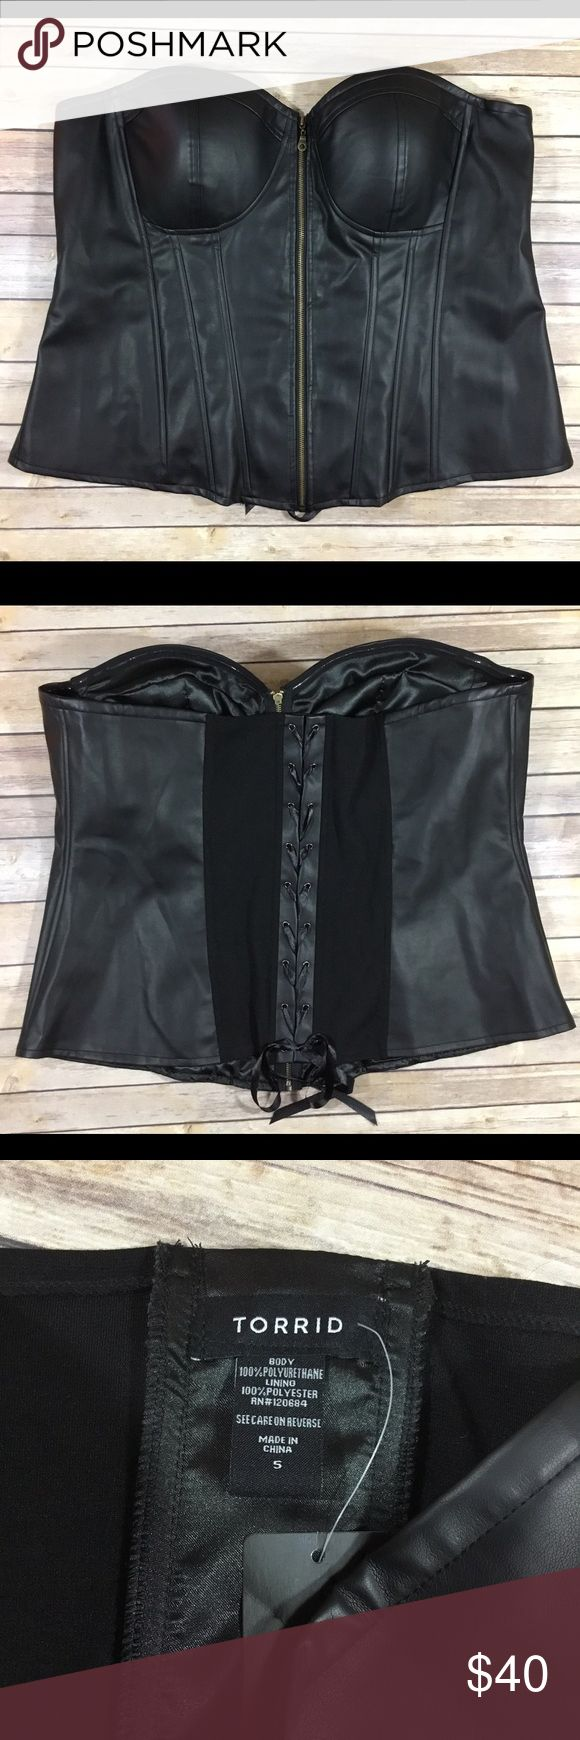 "Torrid NWT Women's Black Corset Bustier 914 Torrid NWT Women's Black Corset Bustier. New With Tags. Plus Size 5X/28. 100% Polyester.  Chest - 49"" Waist - 47"" Hips - 53"" Length in Back - 16"" Length of Zipper - 19"" torrid Intimates & Sleepwear Shapewear"